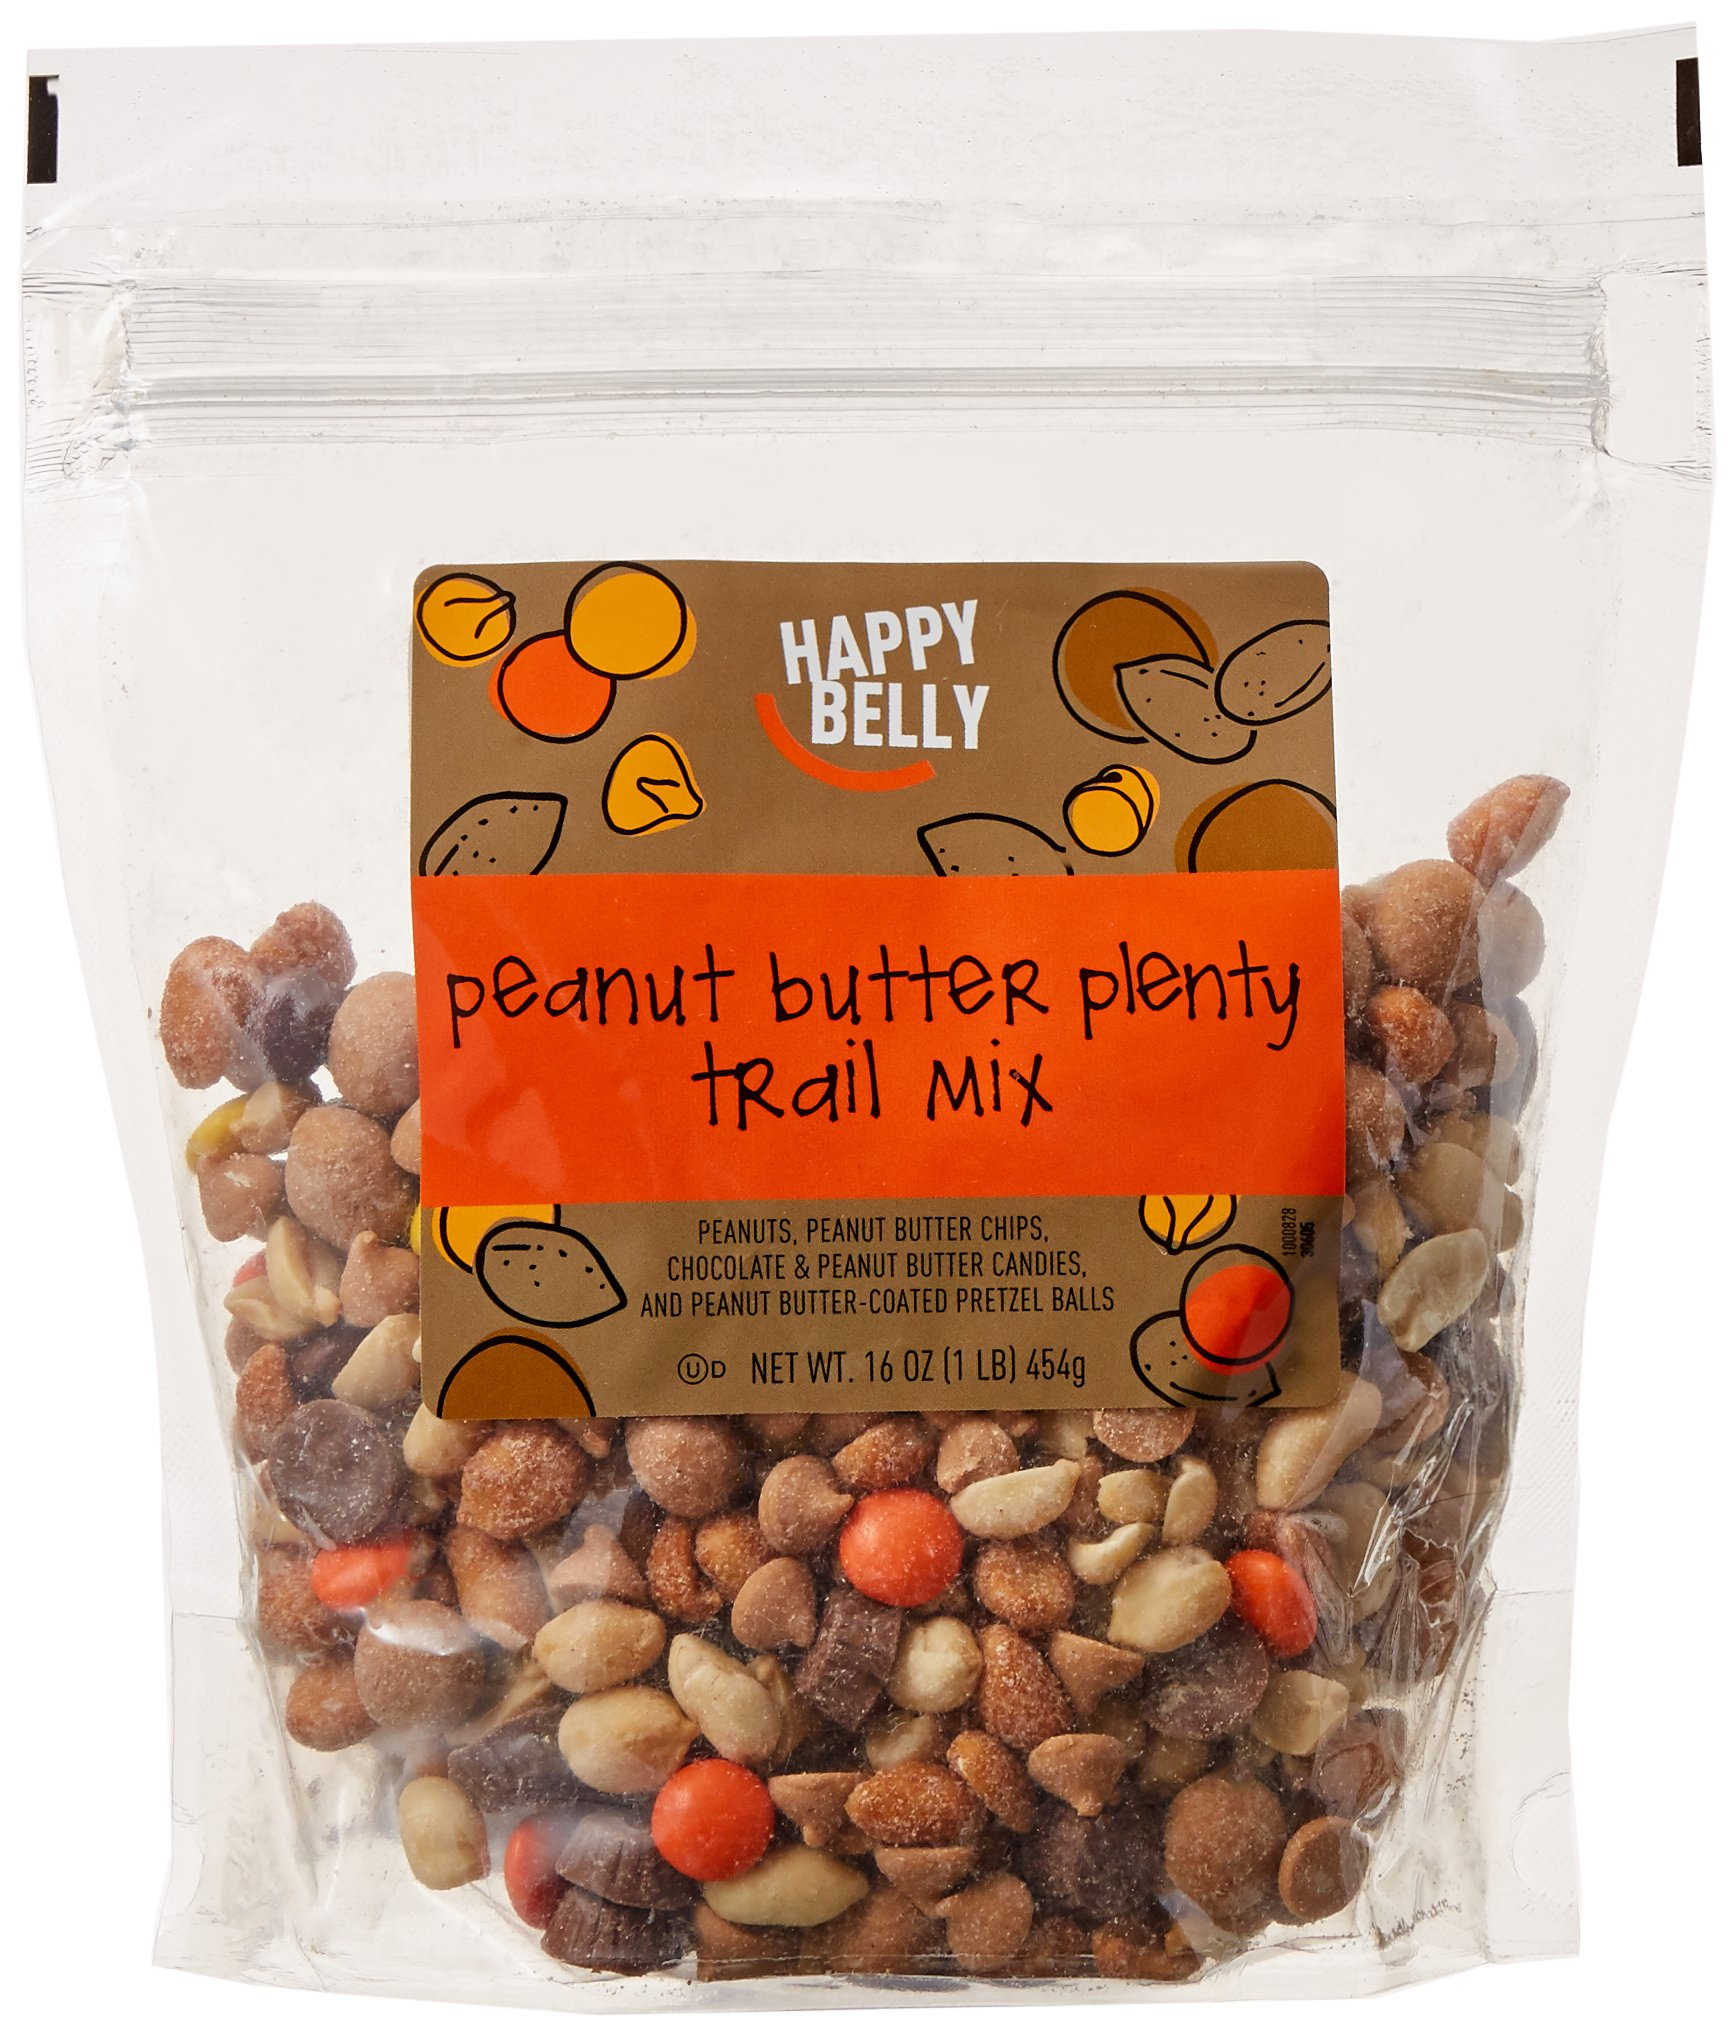 Amazon Brand - Happy Belly Amazon Brand Peanut Butter Plenty Trail Mix, 16 ounce